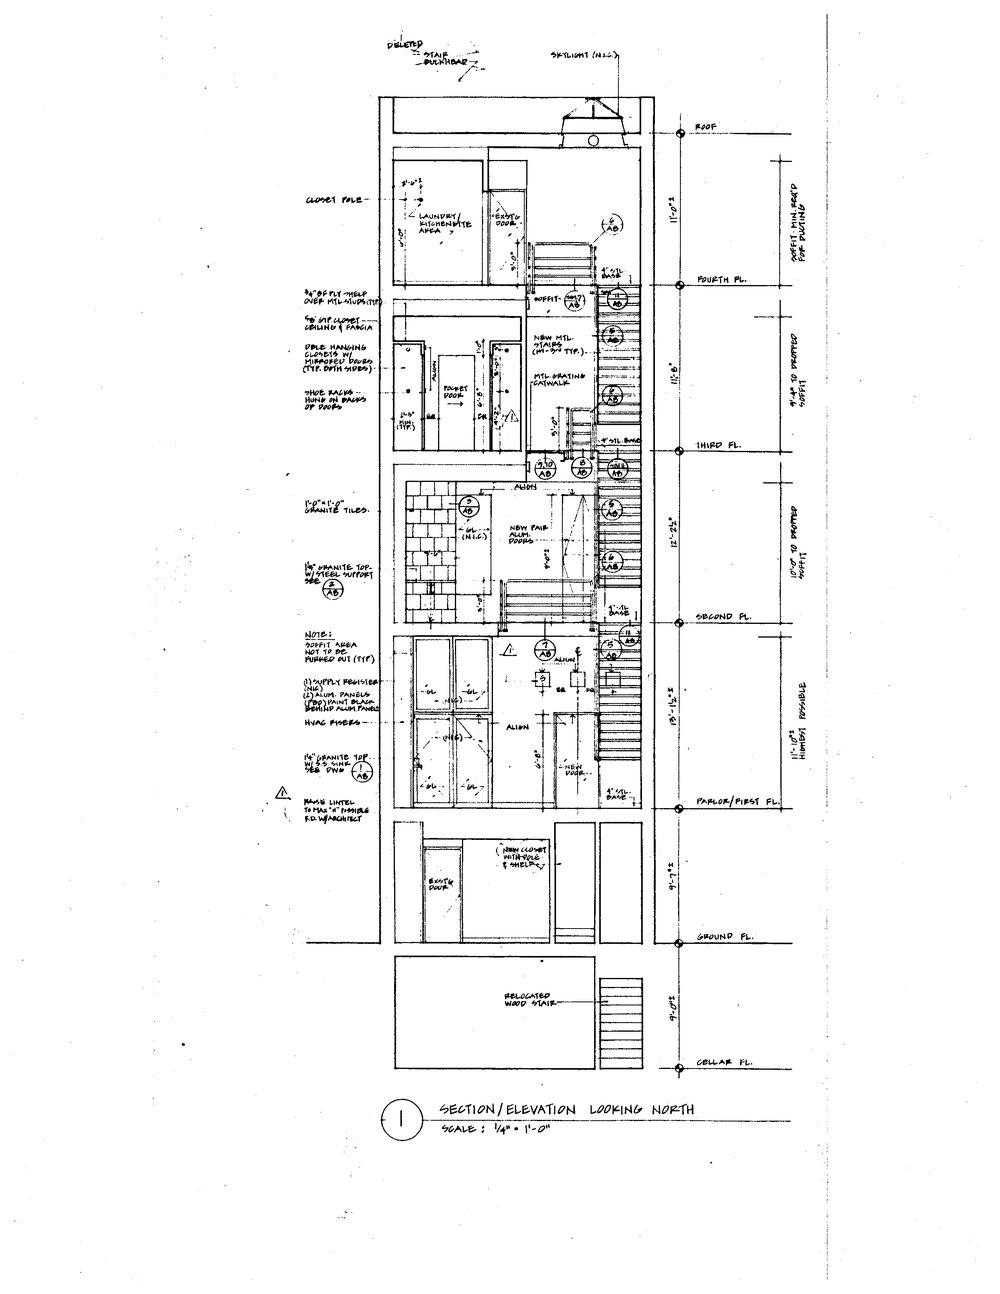 Steensma-Section 1 copy.jpg